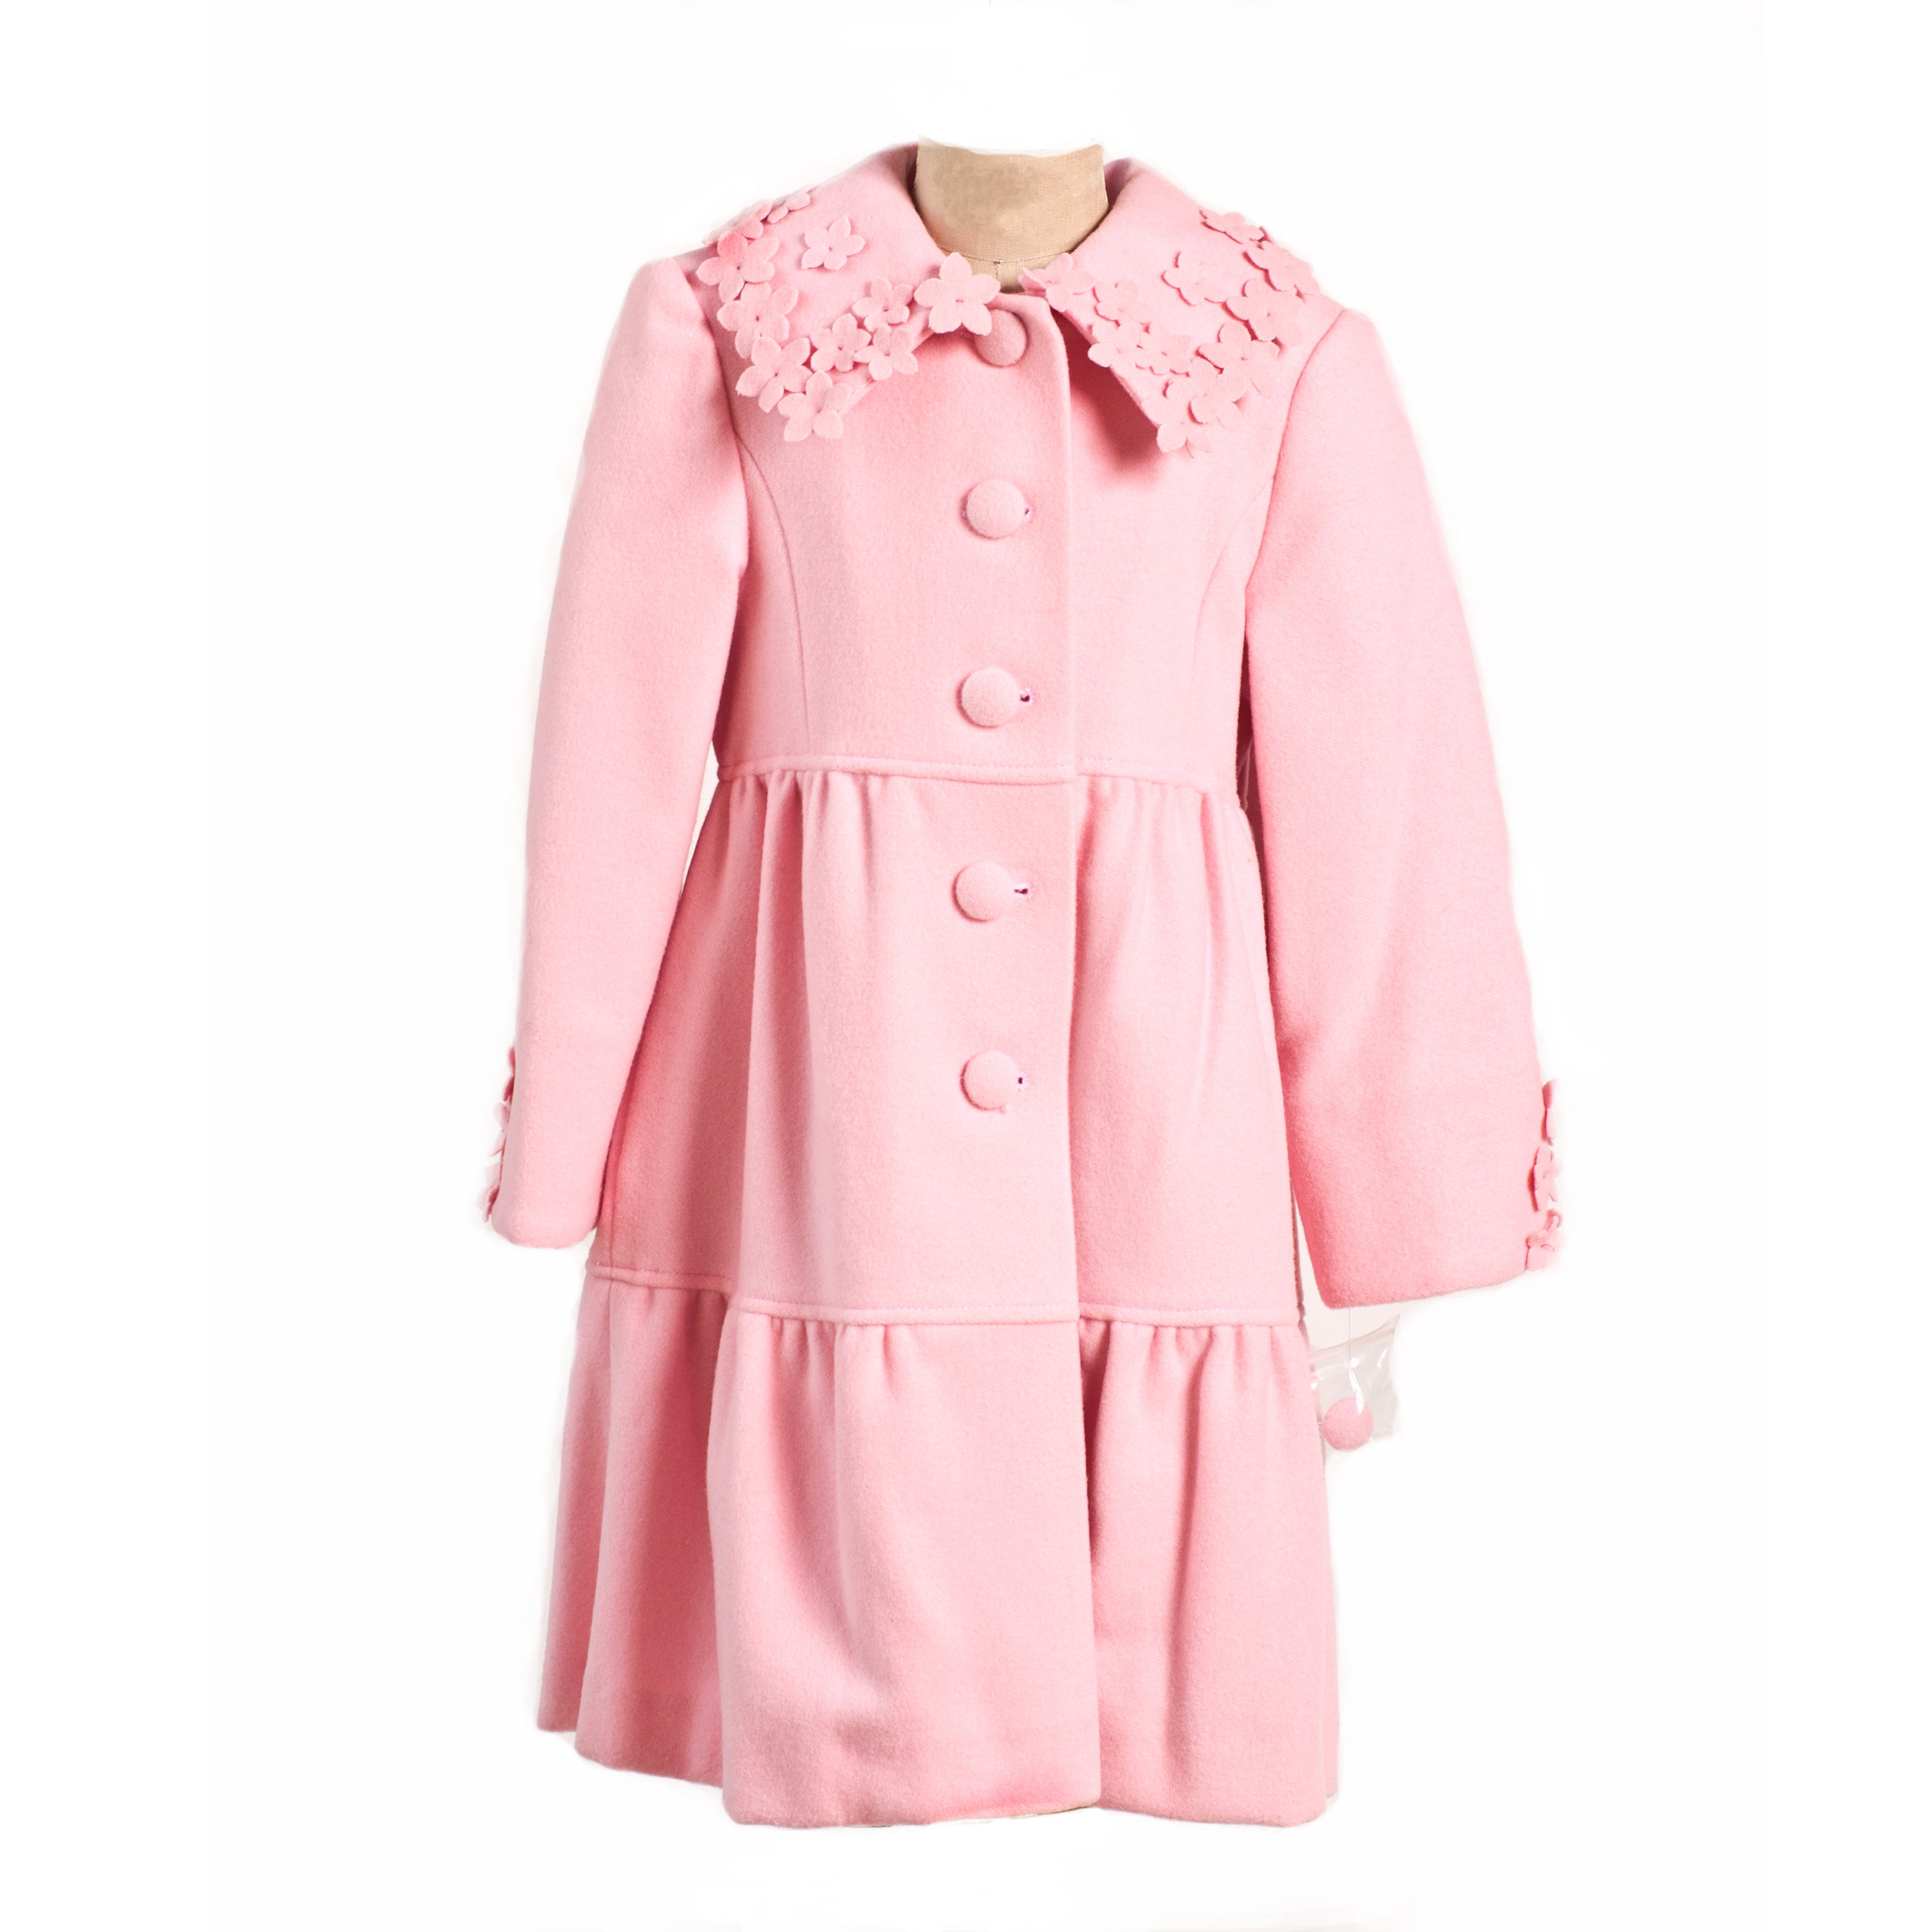 Trilogi Collection Girls Pink Wool Blend Coat